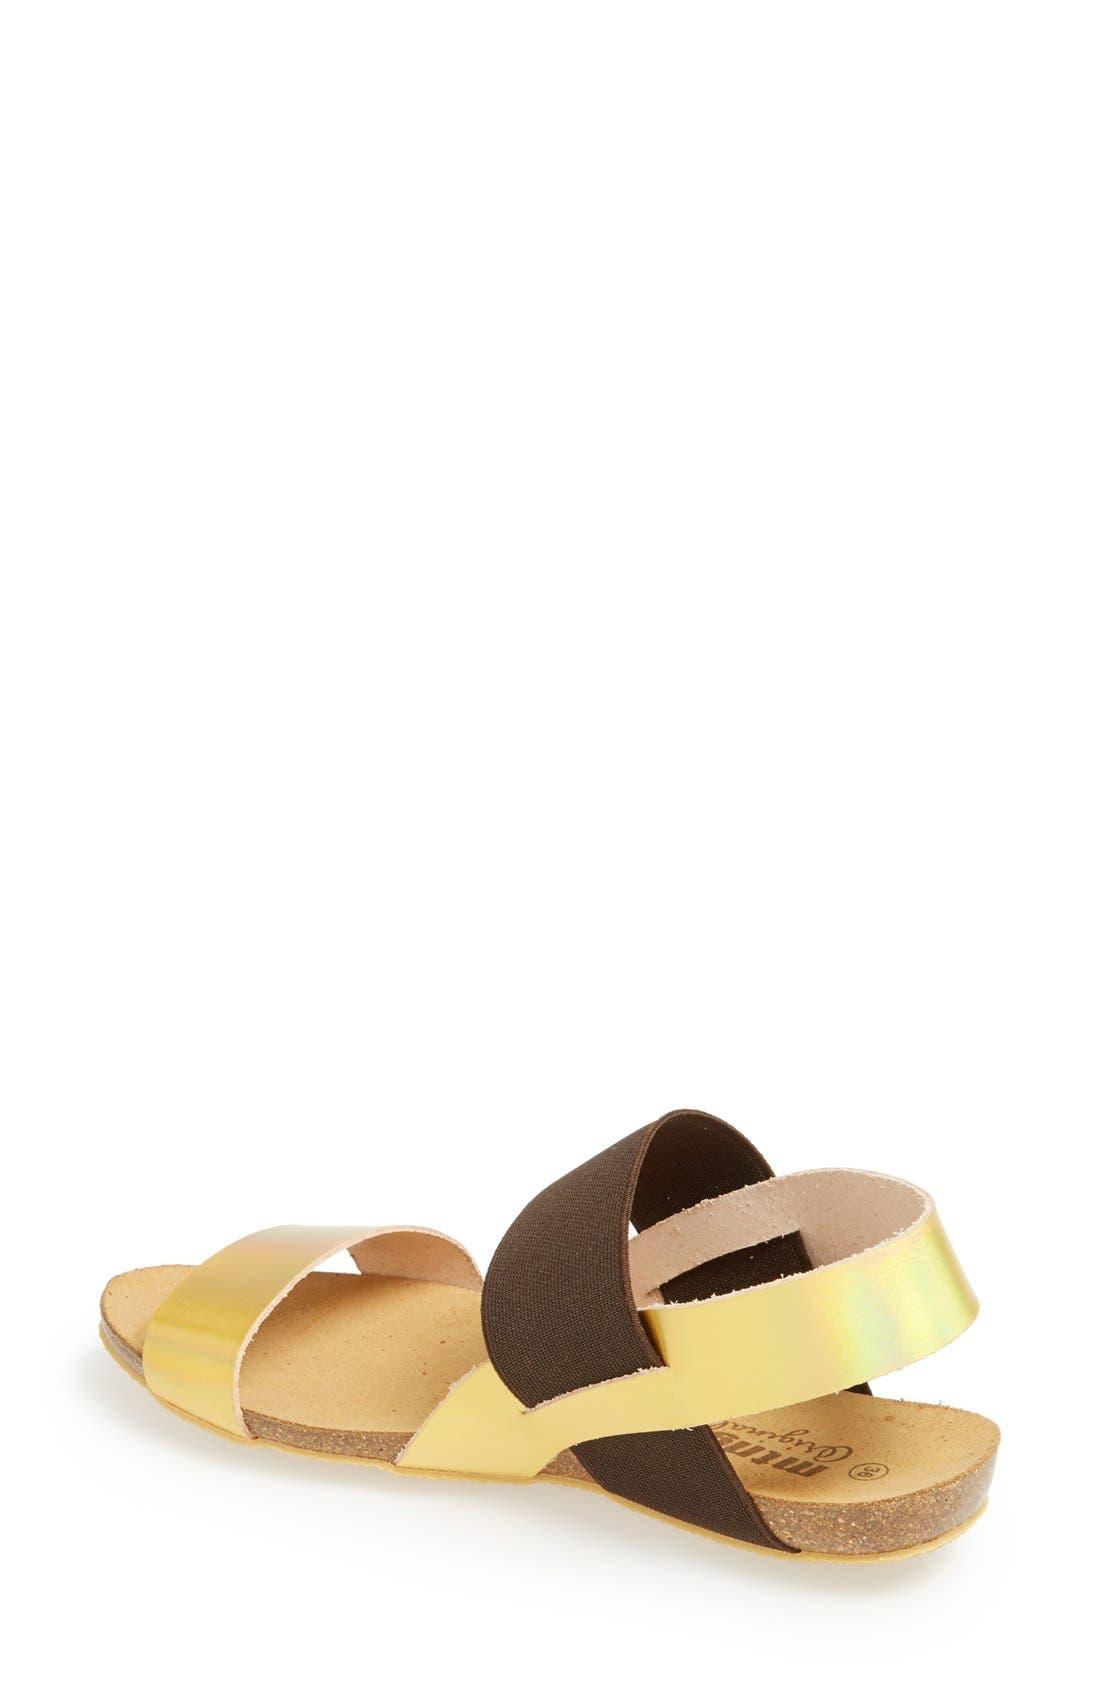 Alternate Image 2  - MTNG Originals 'Annie' Colorblock Sandal